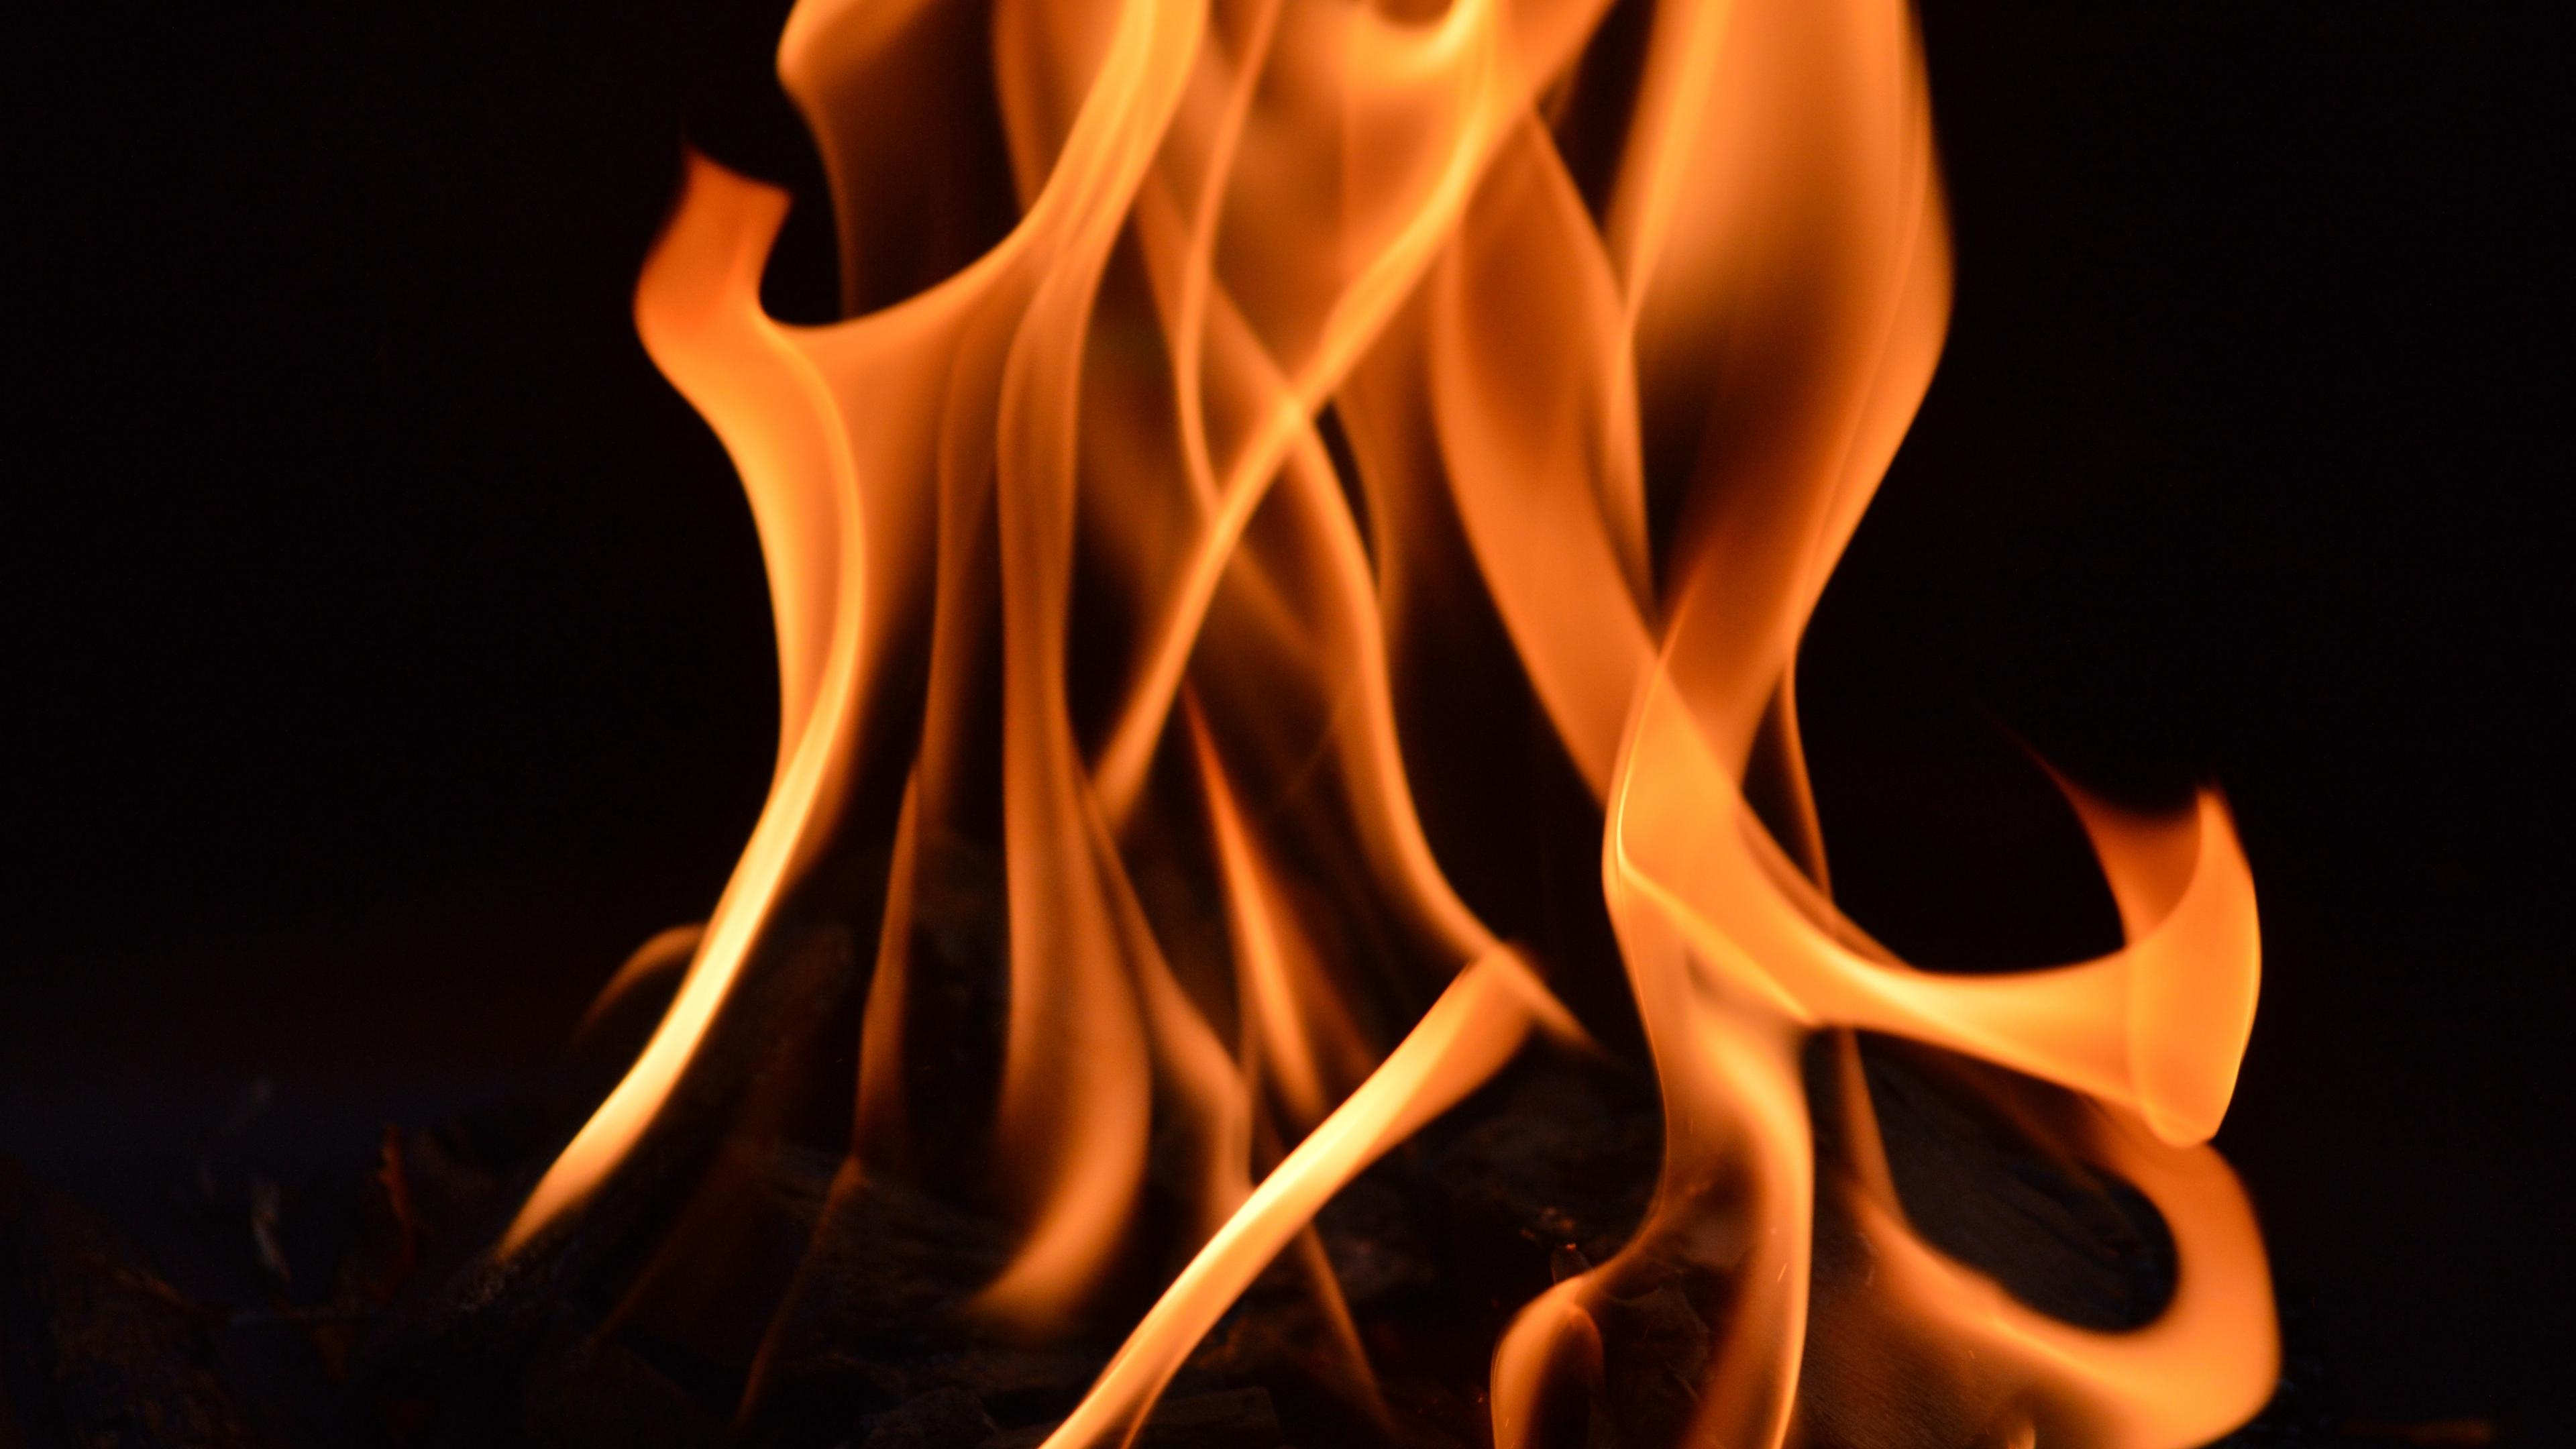 bonfire flame fire 4k 1539369733 - bonfire, flame, fire 4k - flame, Fire, bonfire